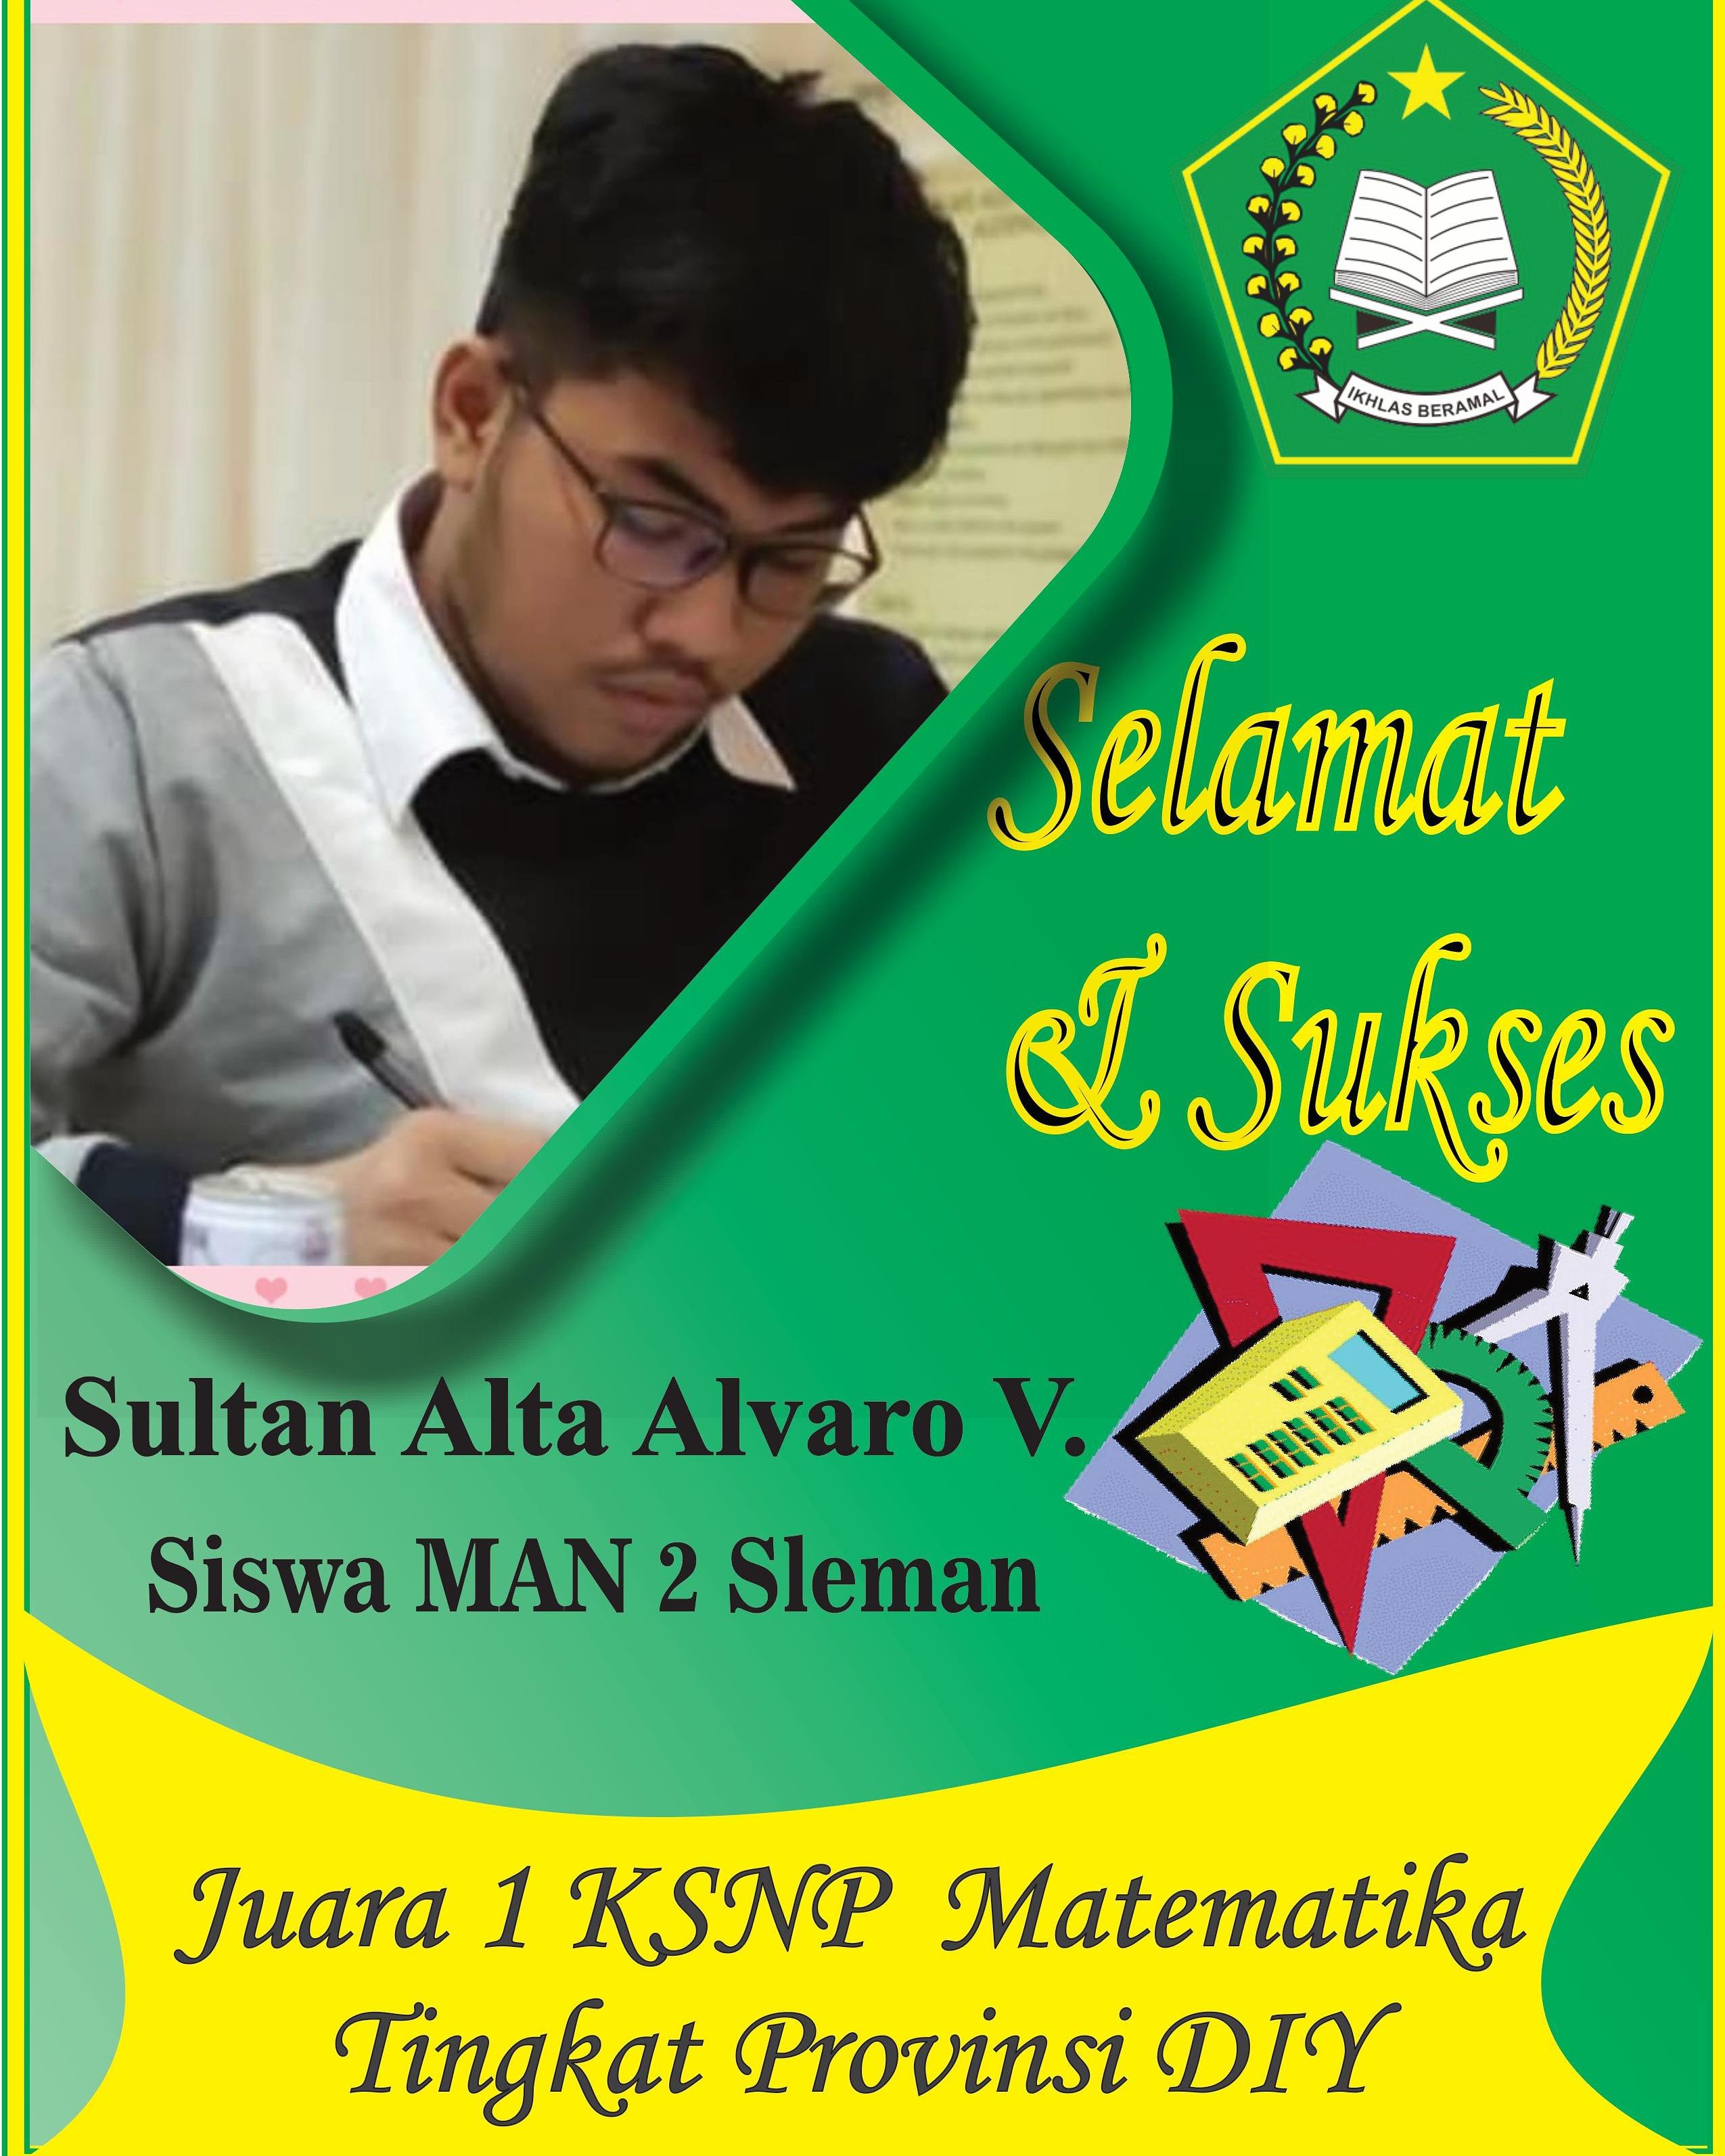 Juara 1 KSNP Matematika Tingkat Provinsi DIY